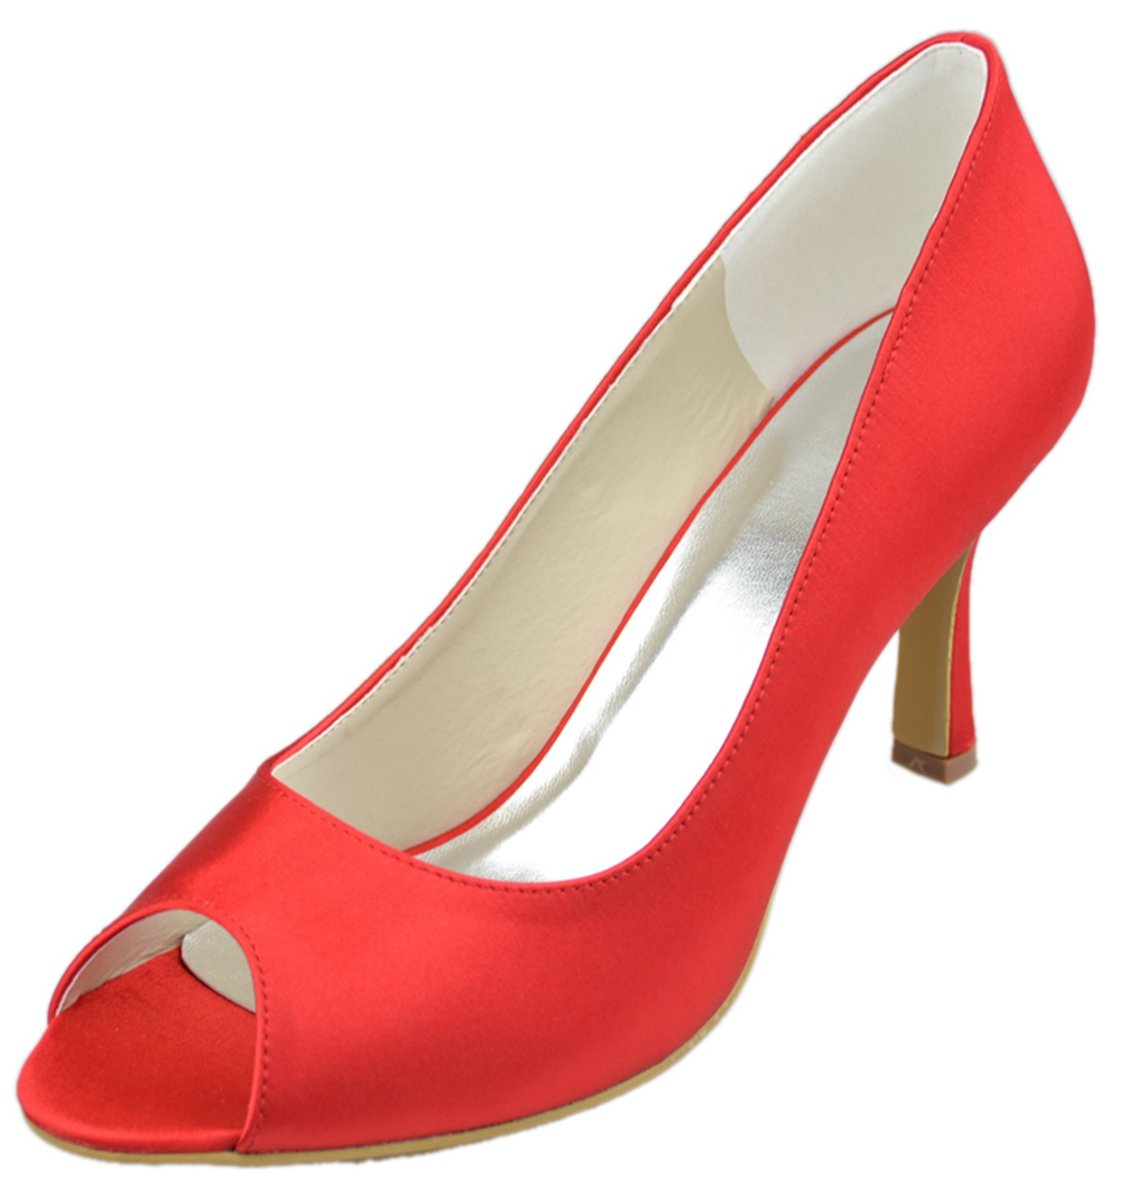 Minitoo Rouge , Peep-Toe B07CMHTFF6 femme Rouge - femme rouge 77da4e8 - deadsea.space